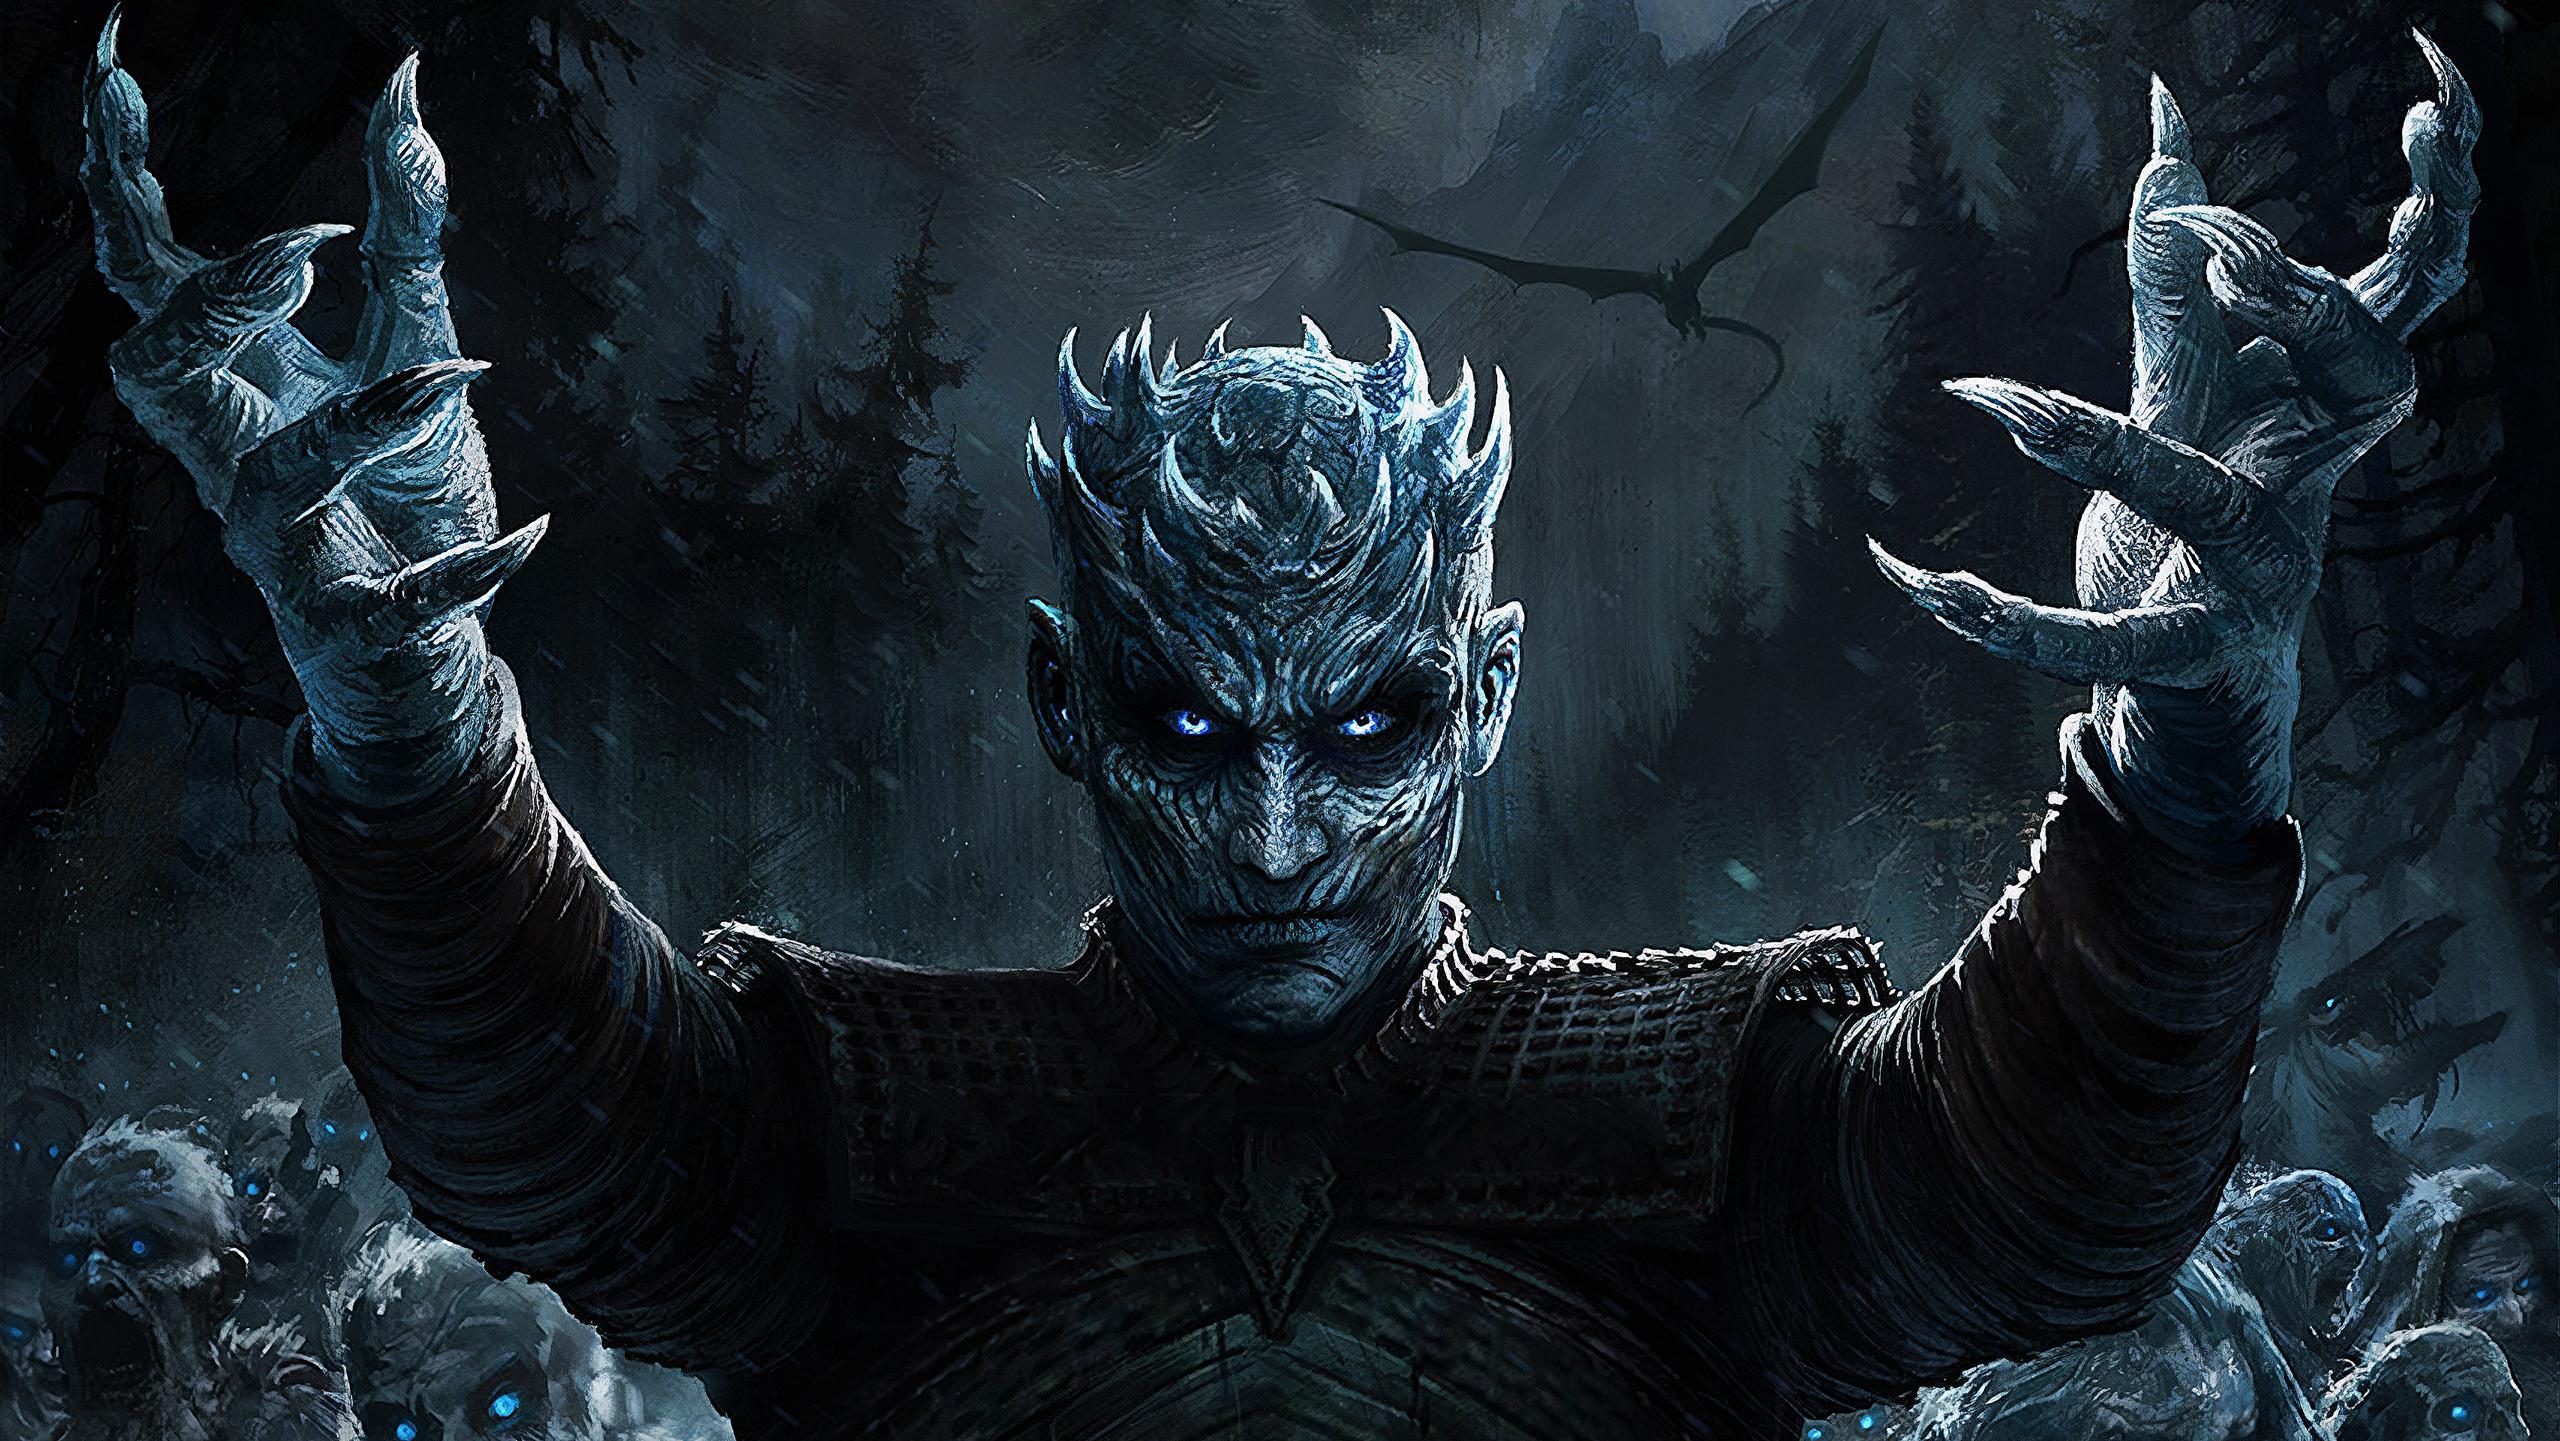 2048x1152 Night King Game Of Thrones Season 8 Art 2048x1152